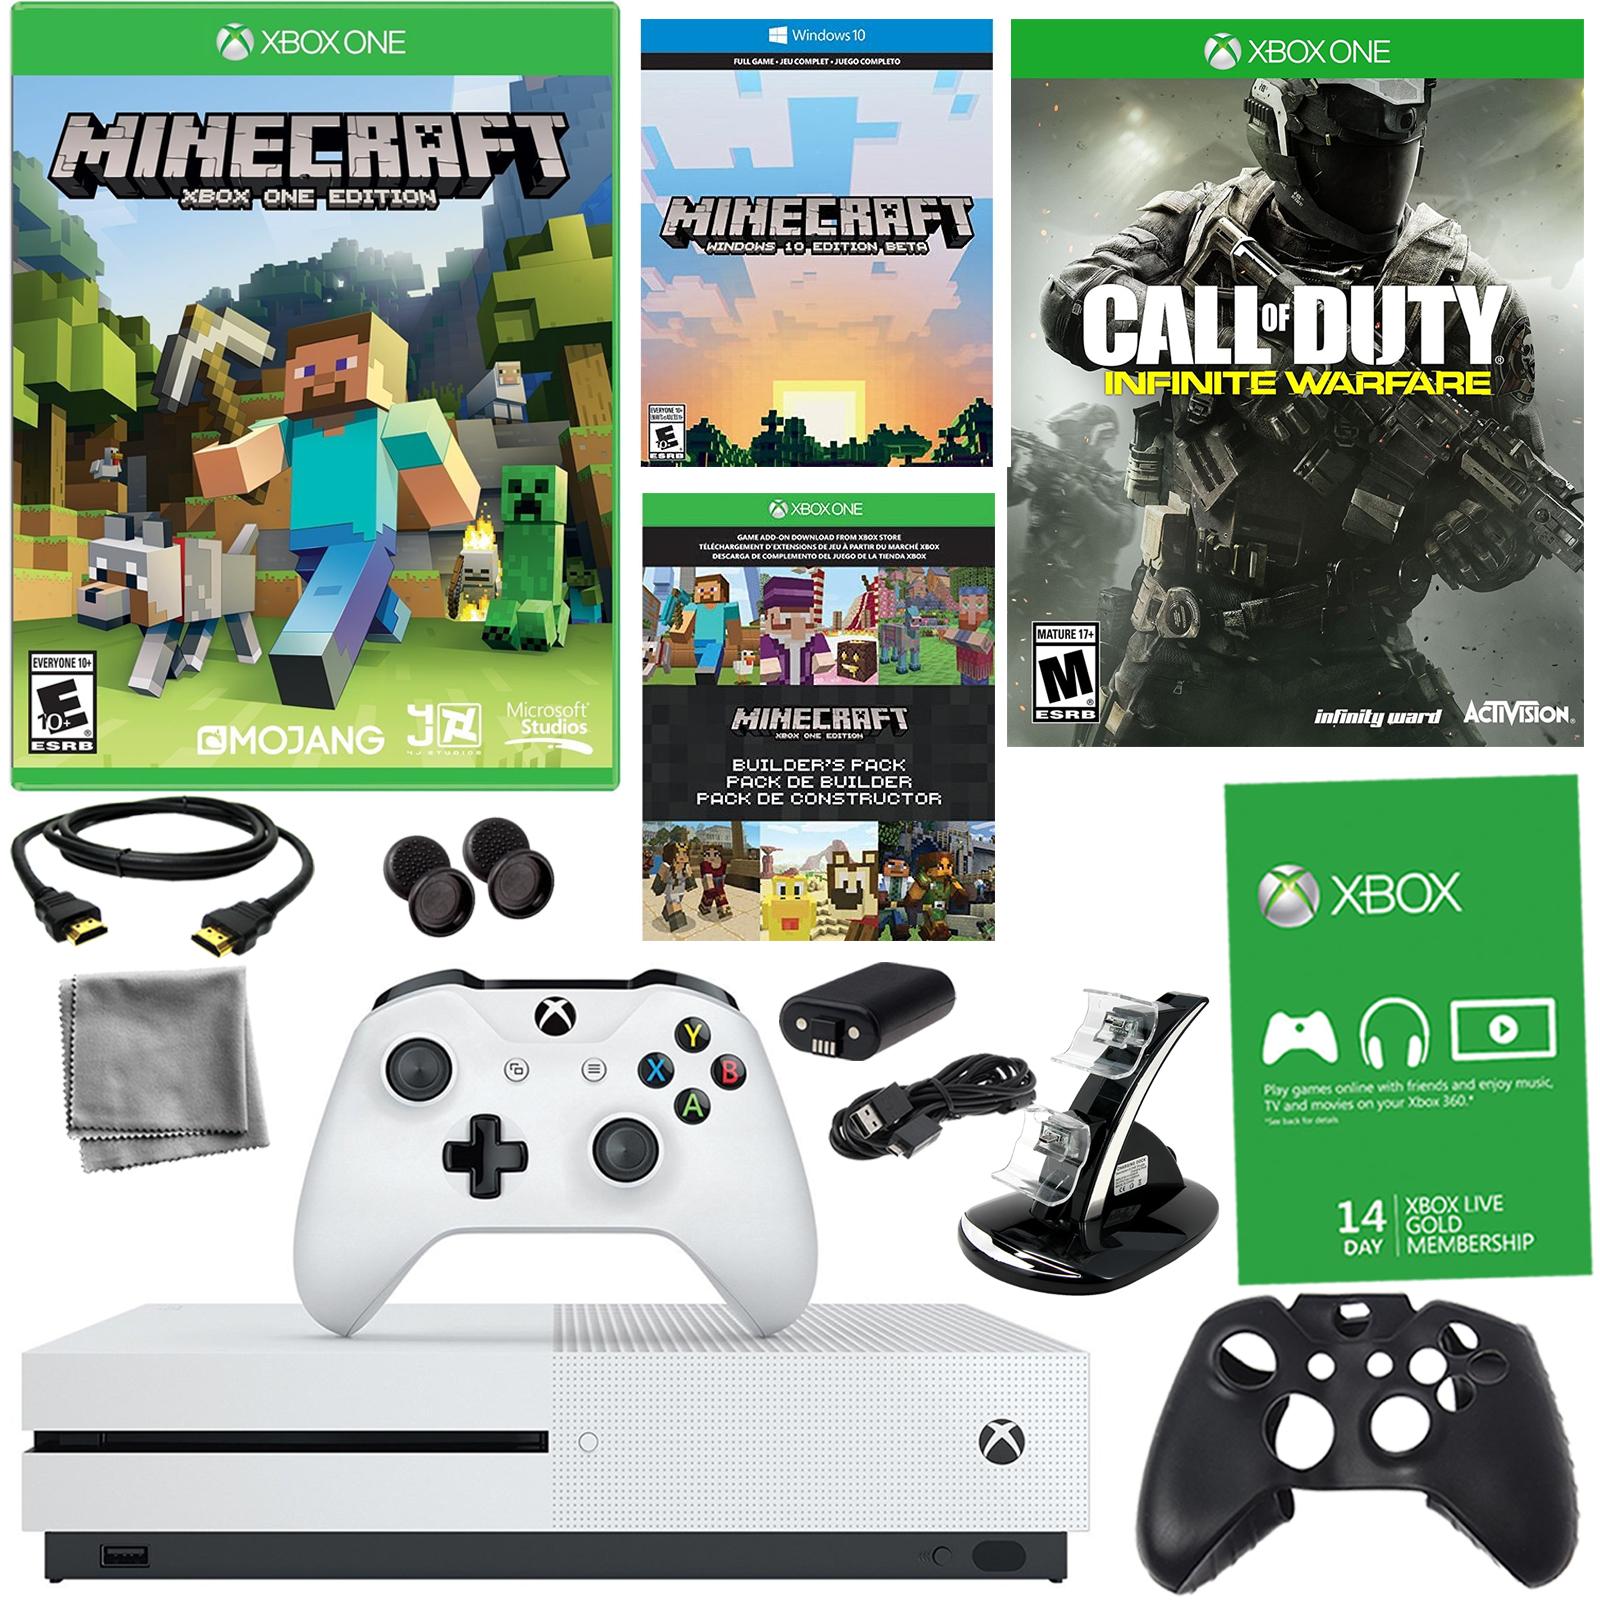 Xbox One S 500GB Minecraft Bundle With Infinite Warfare  8 in 1 Kit En VeoyCompro